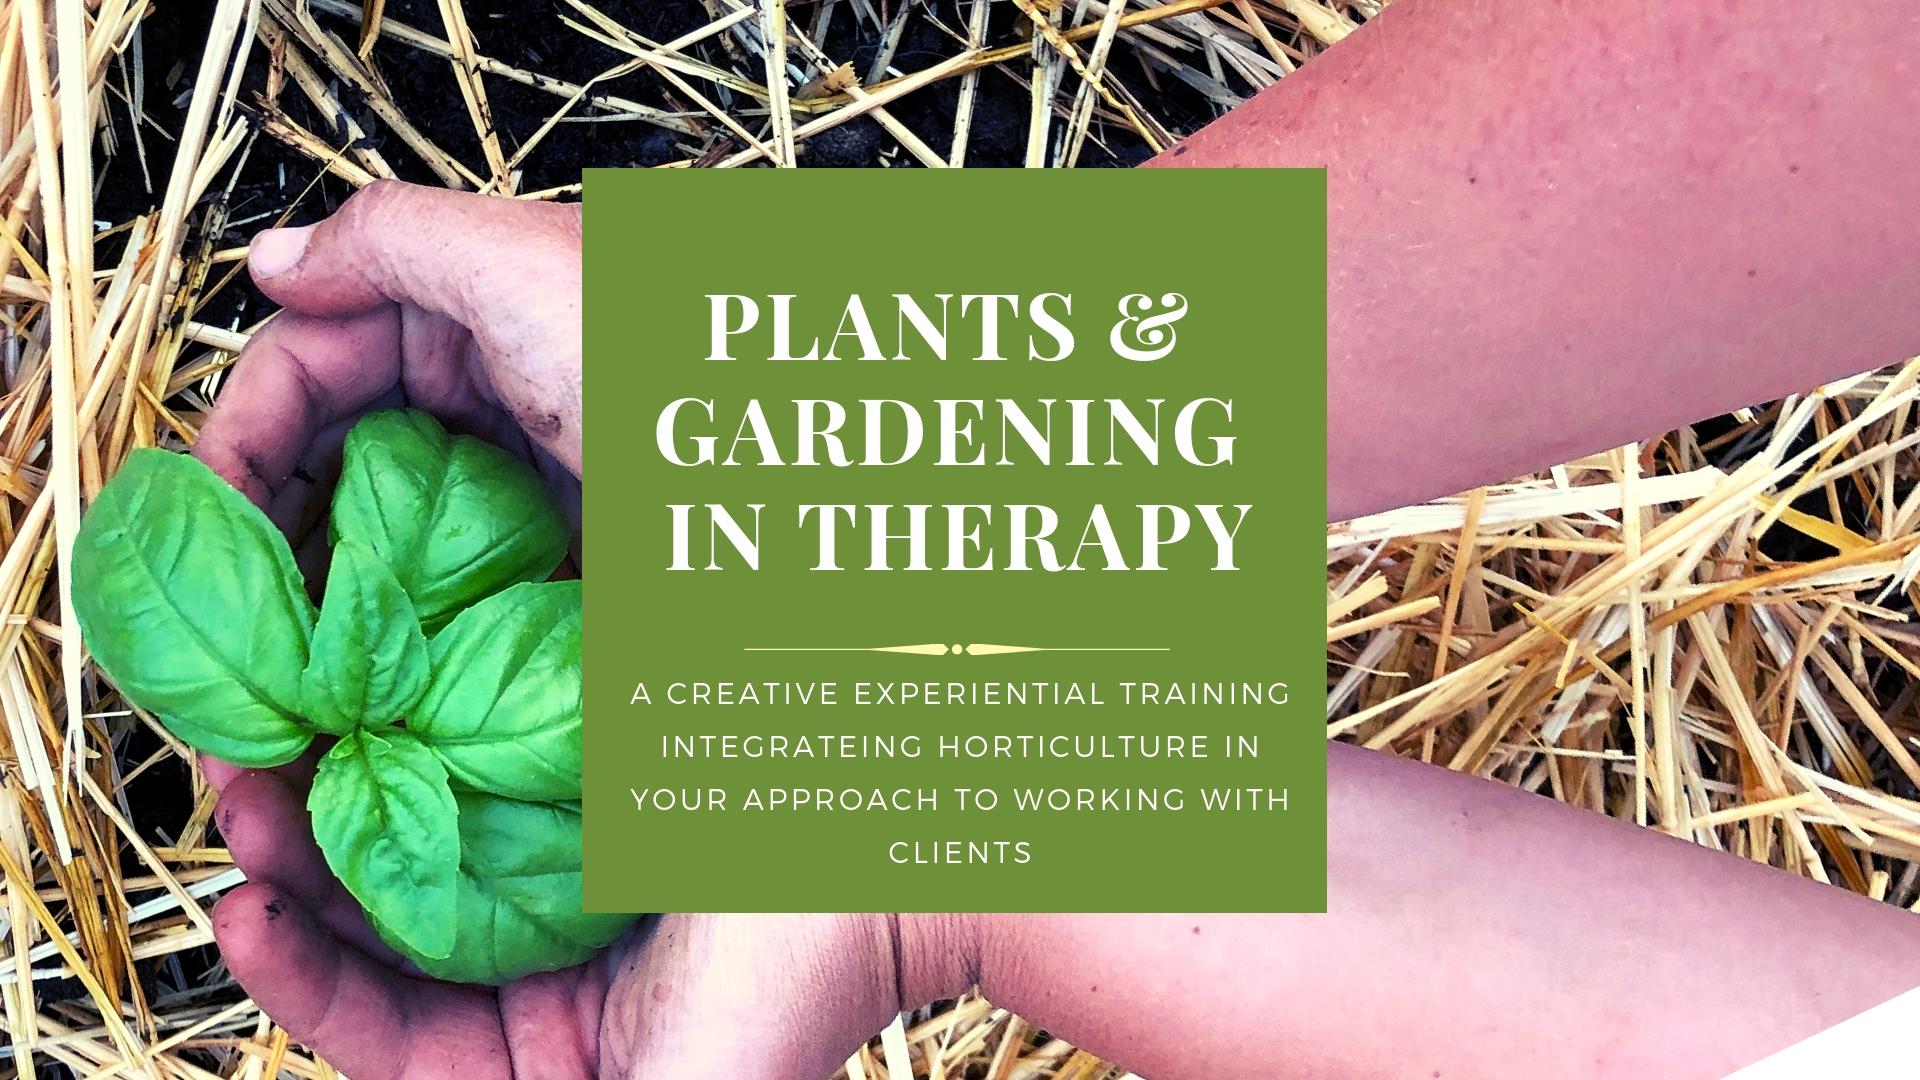 Plants&Gardening in therapy.jpg